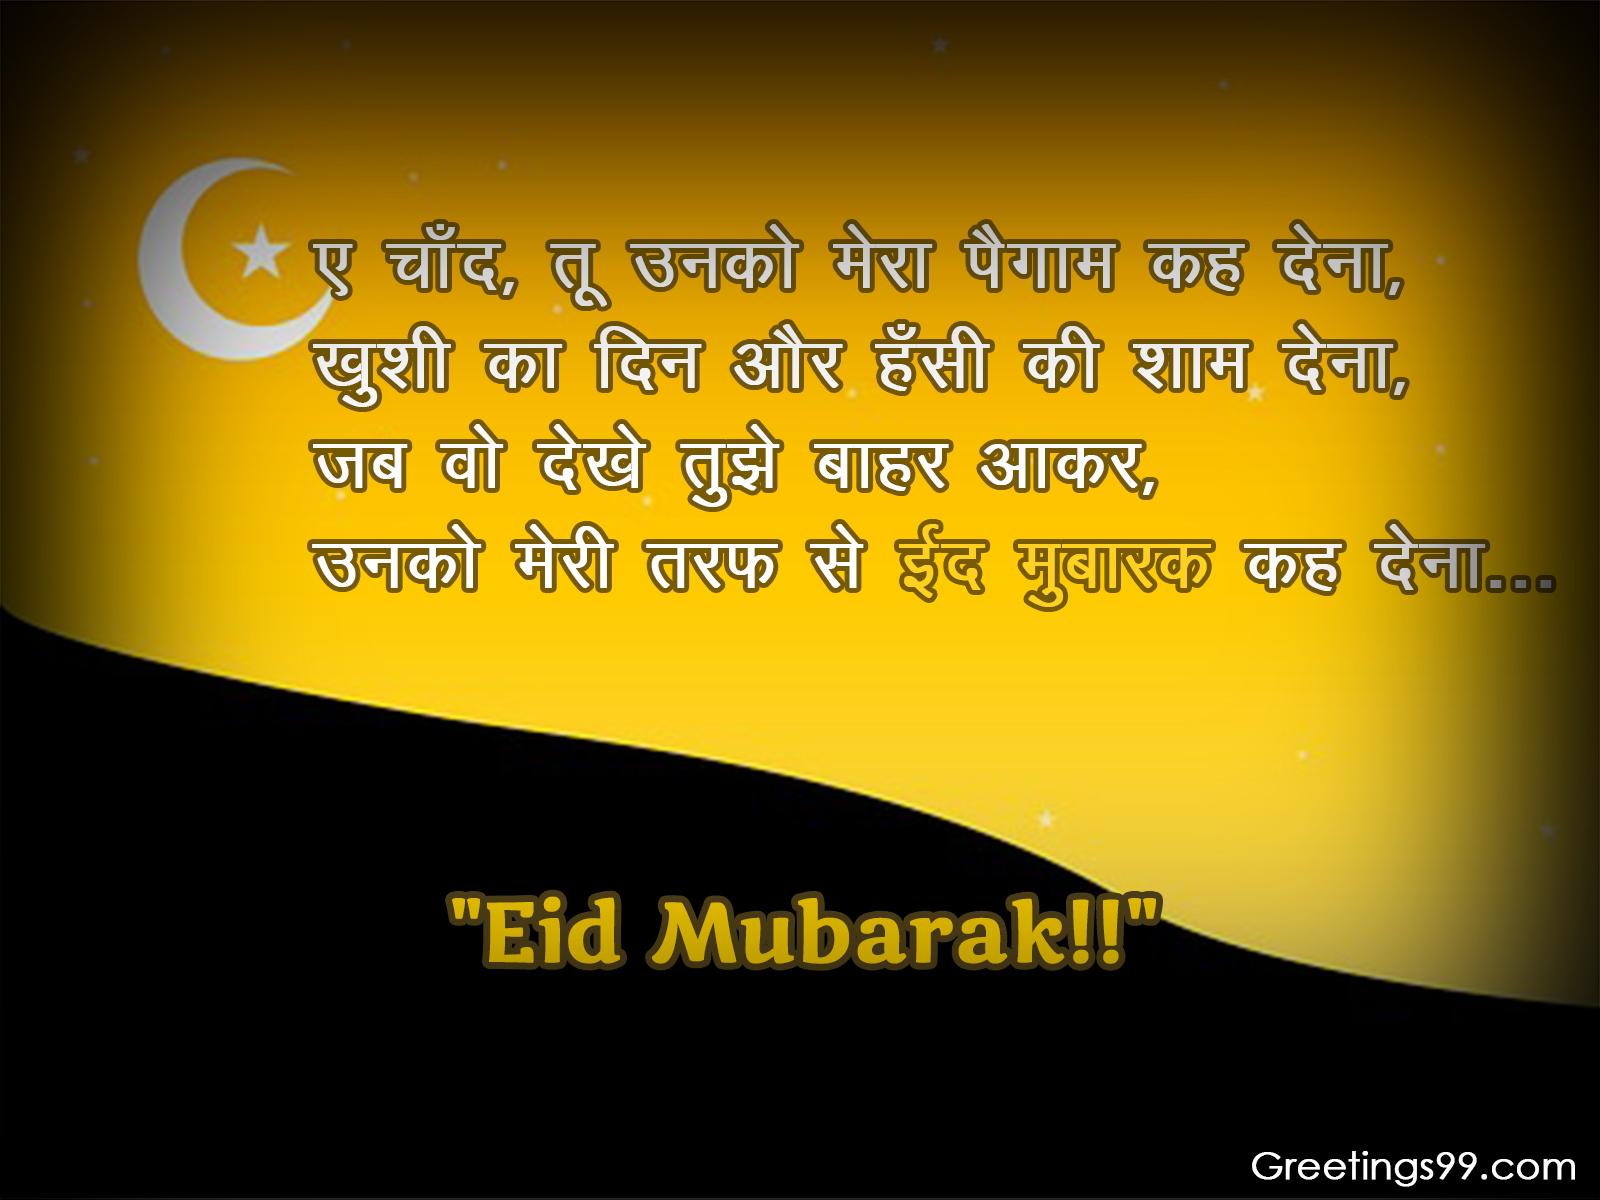 Best 2018 Eid Mubarak Quotes Eid Mubarak Wallpaper Eid Al Fitr